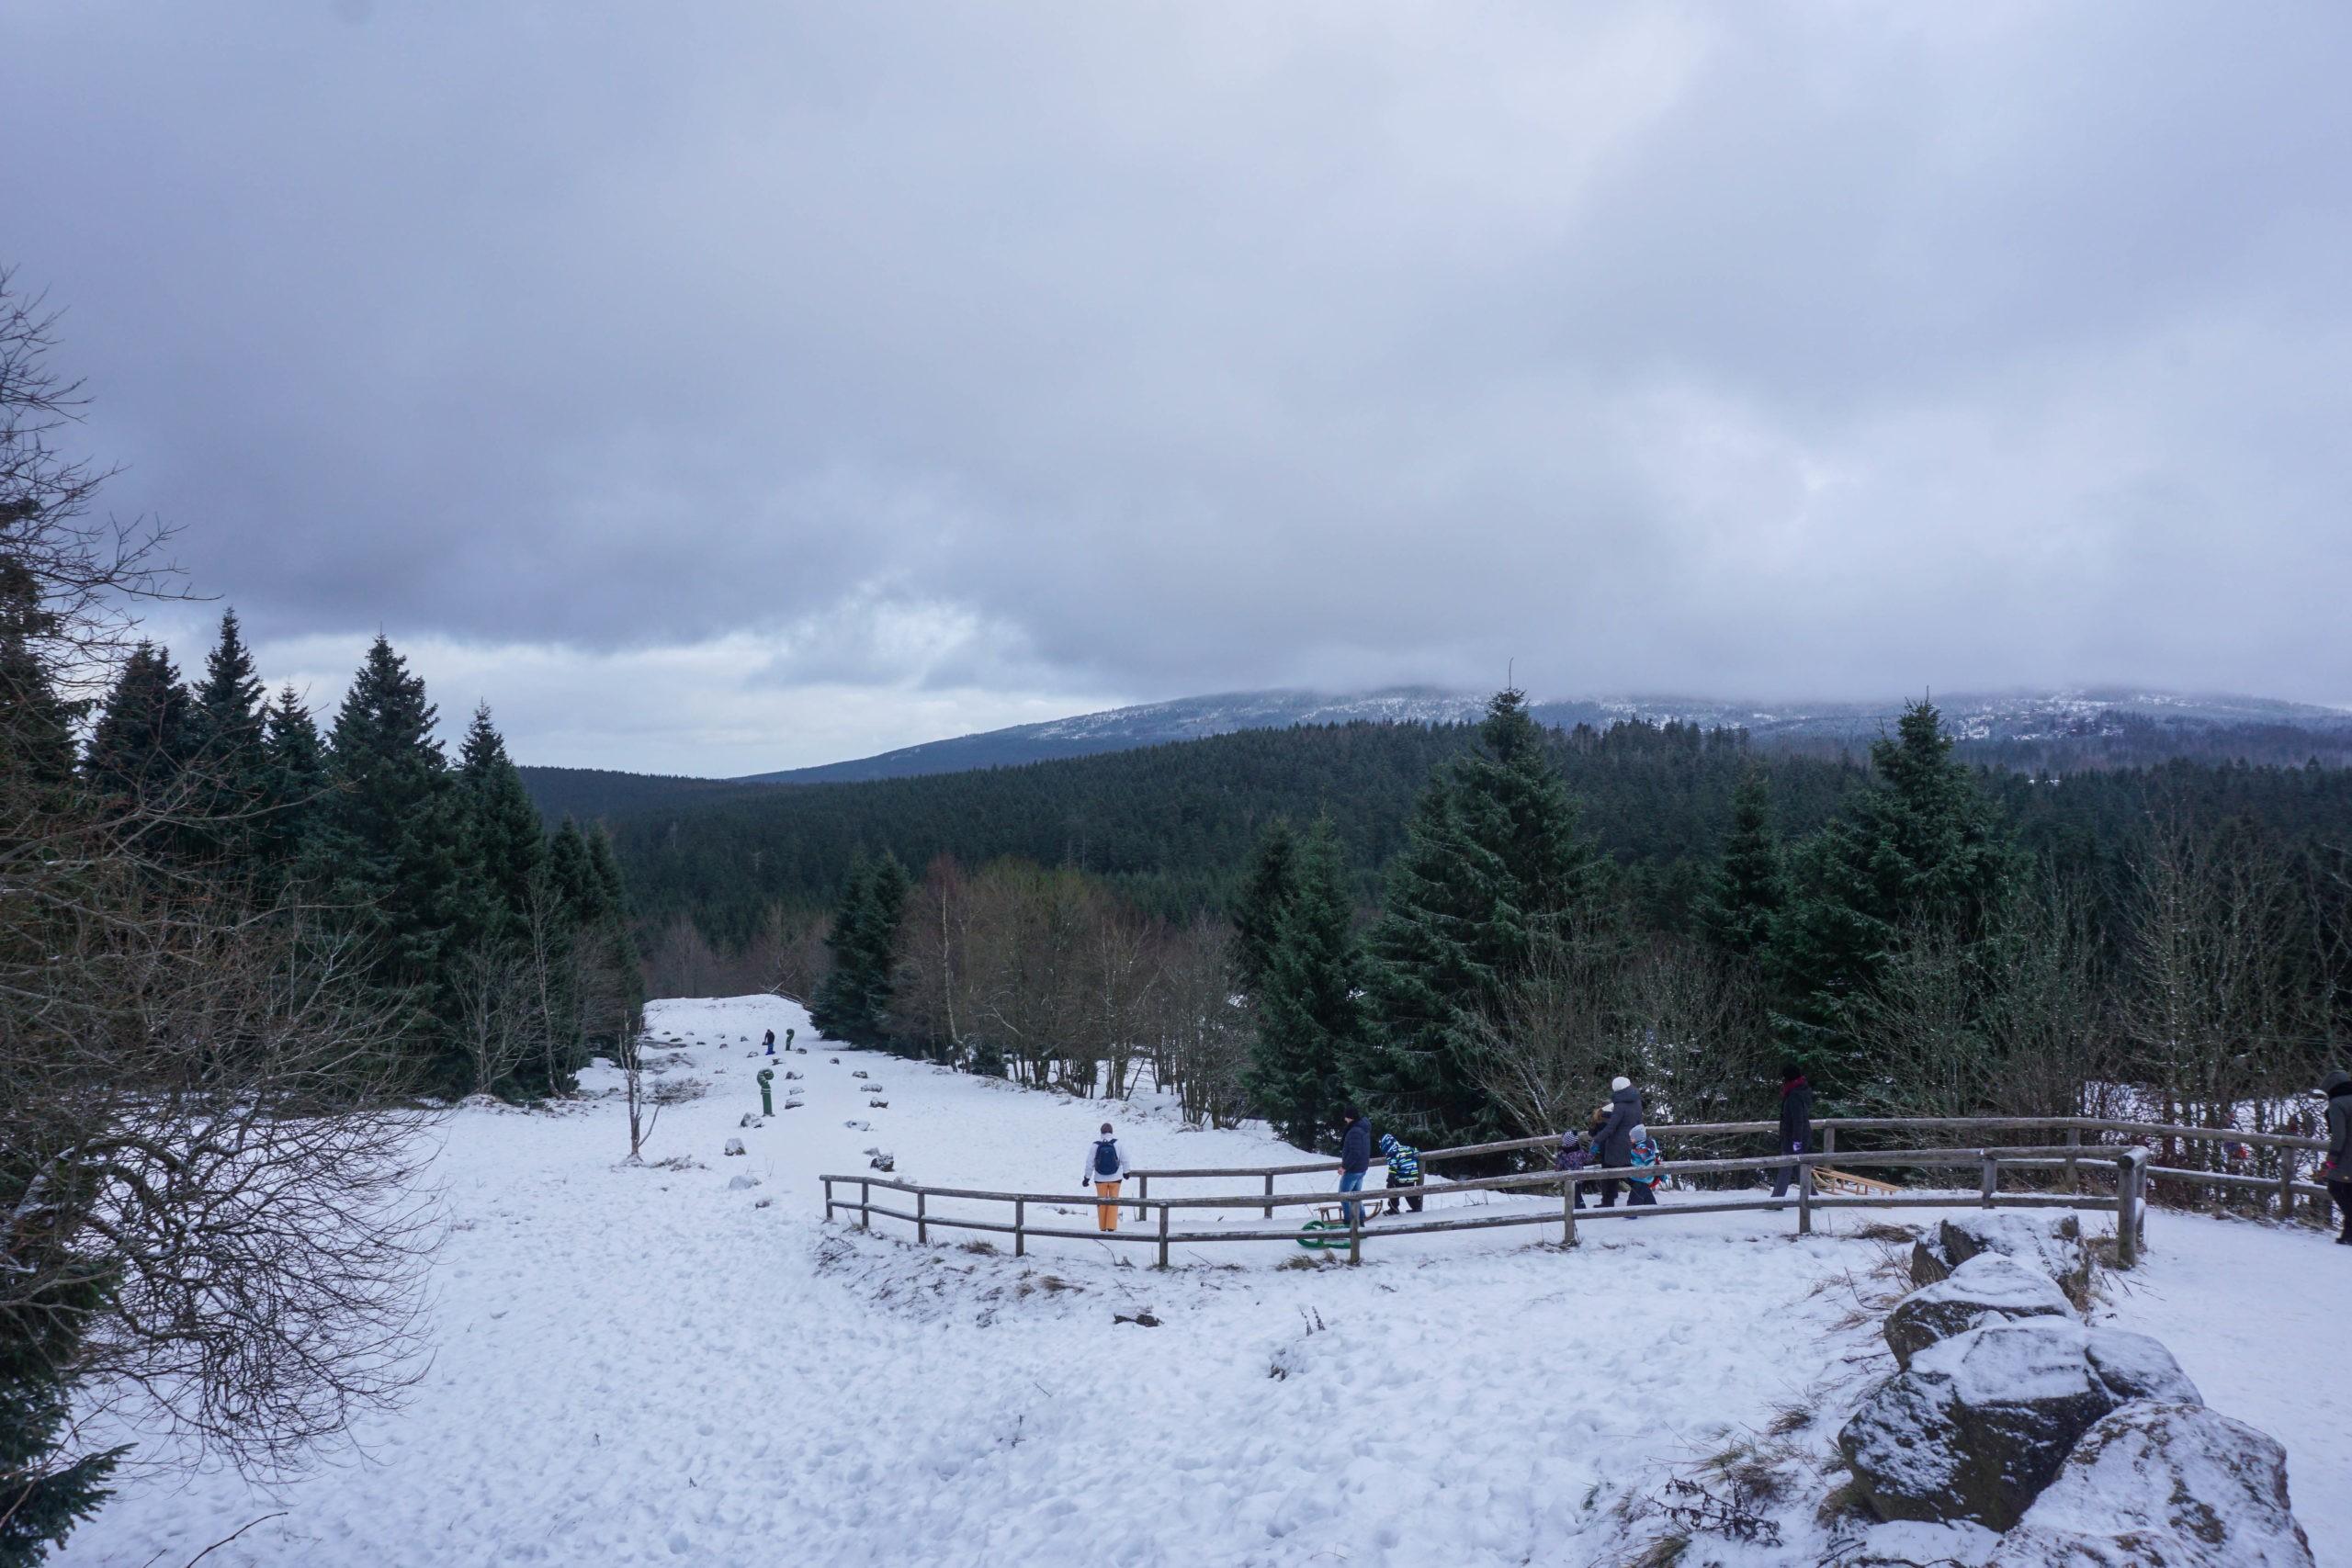 Torfhaus - Wandern im Schnee ©Vickiviaja